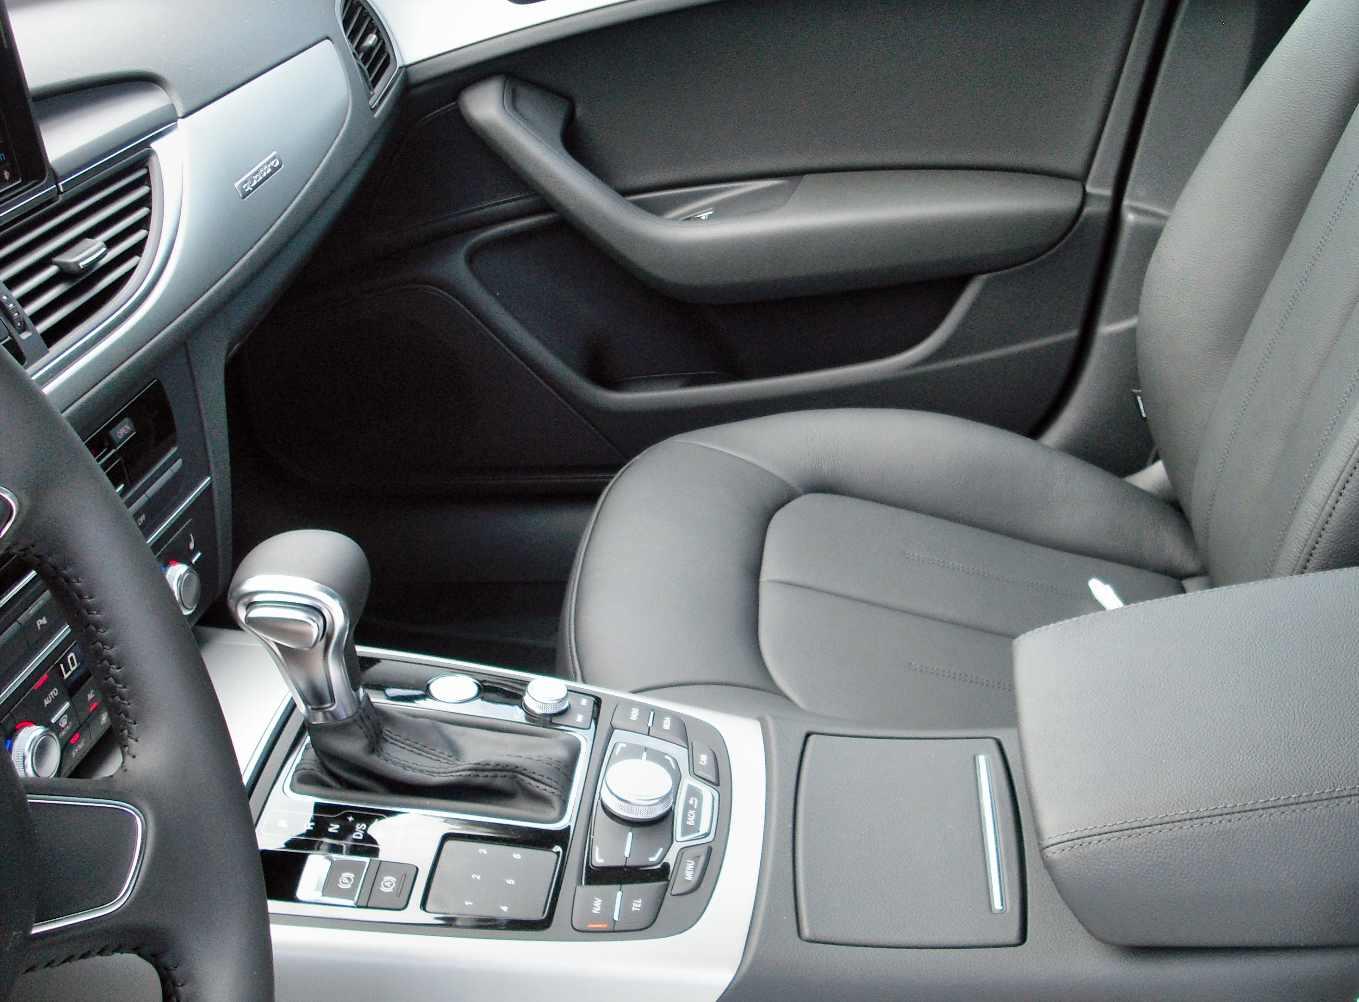 Audi A6 Neues Modell 2011 Limousine Export Schweiz Eu Neuwagen Reimport S Tronic Leder Xenon